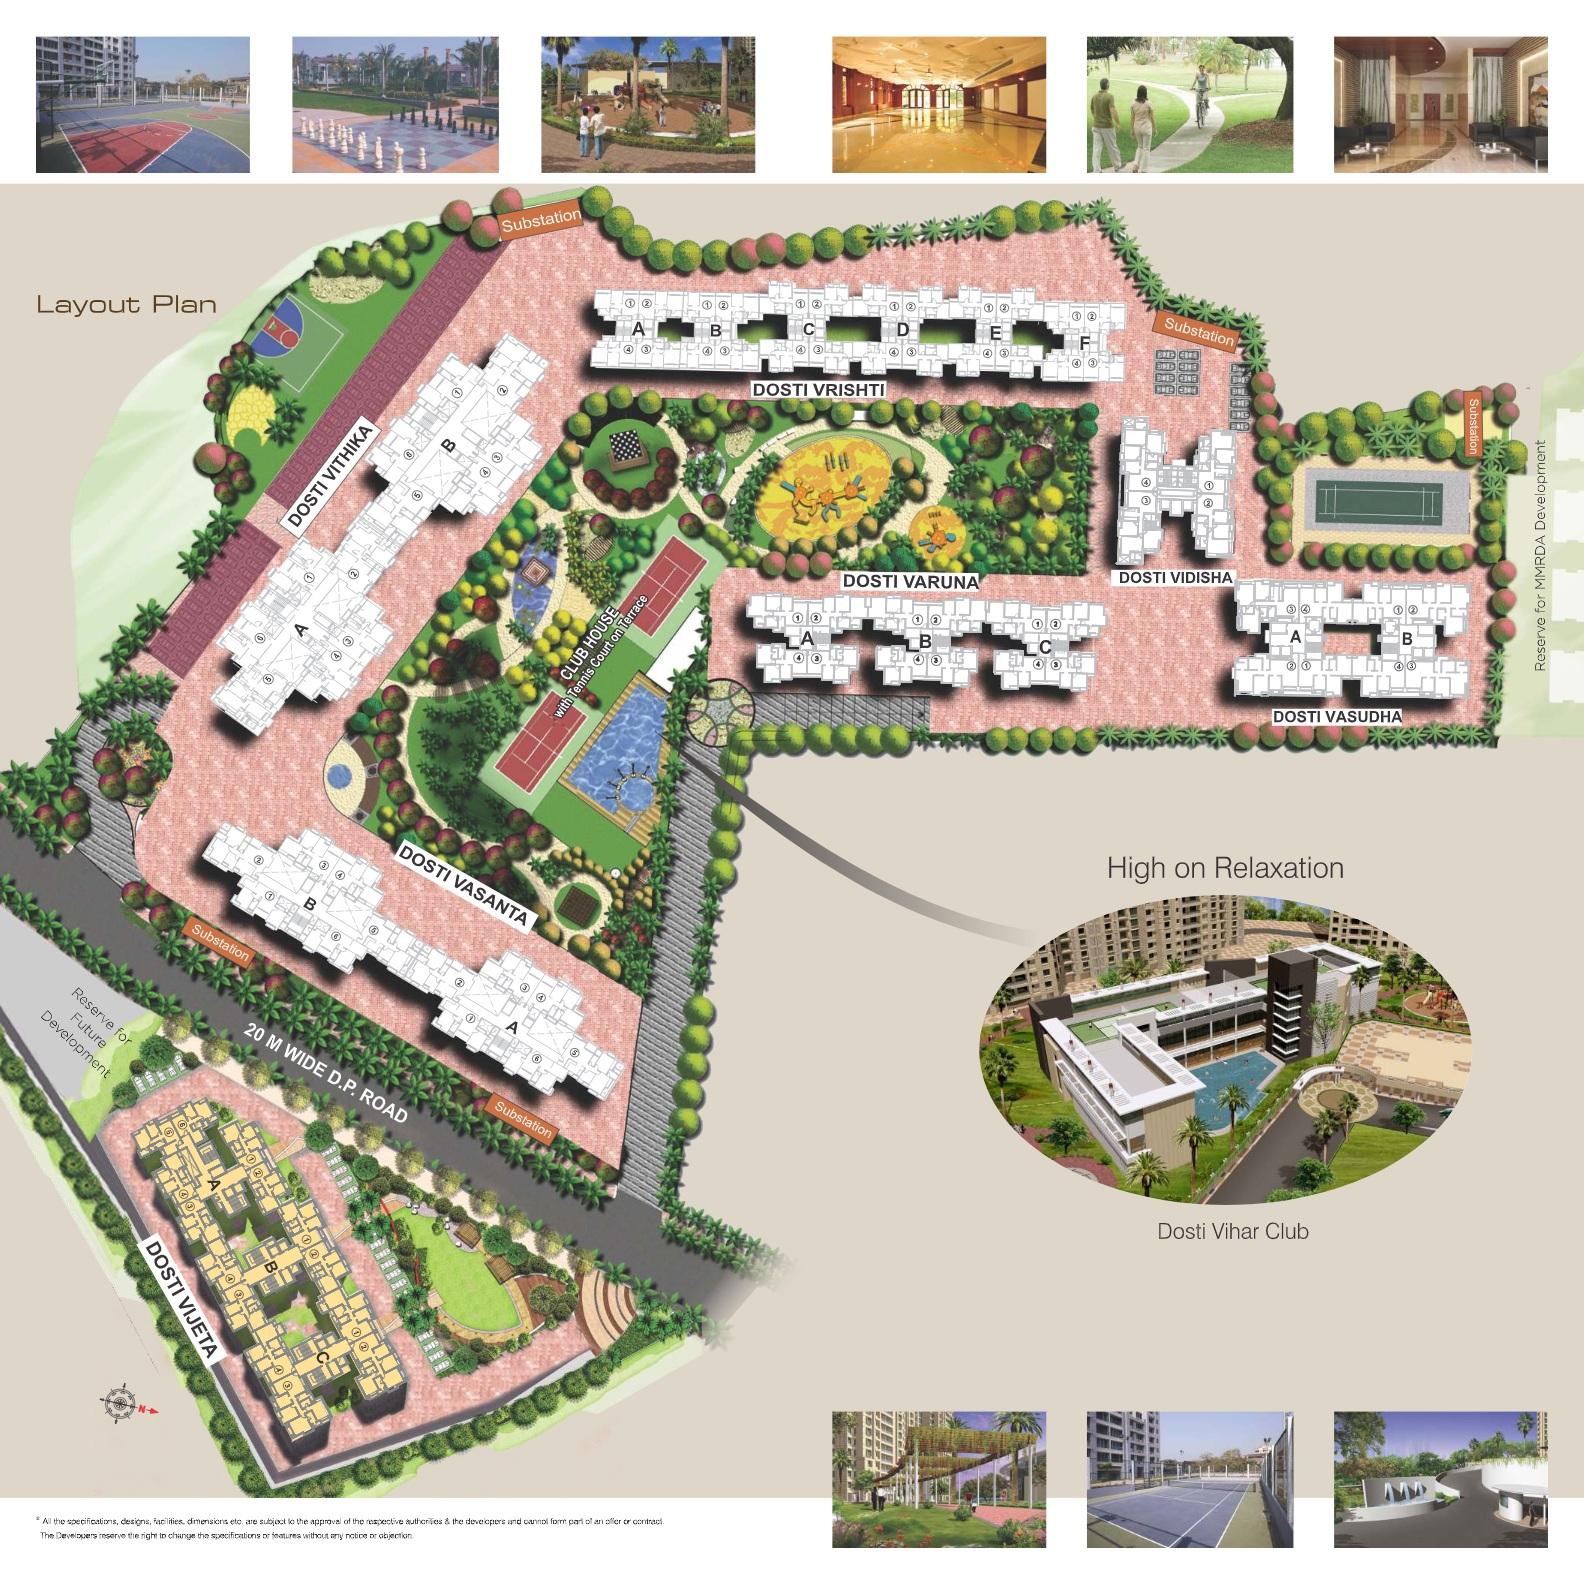 dosti vasudha project master plan image1